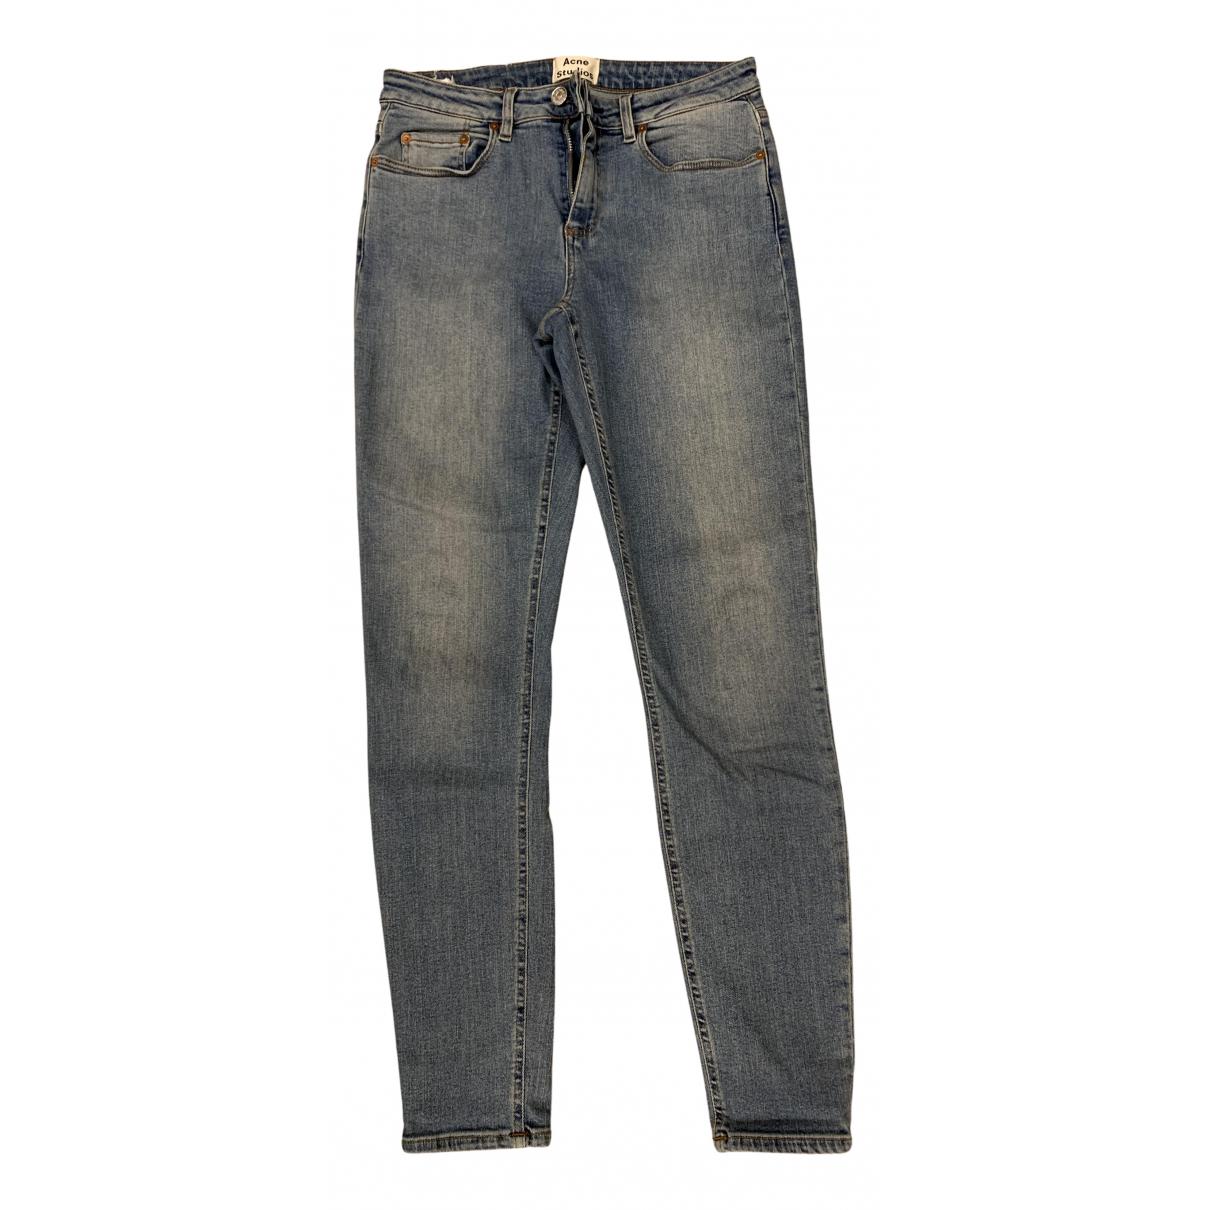 Acne Studios Skin 5 Blue Denim - Jeans Jeans for Women 28 US